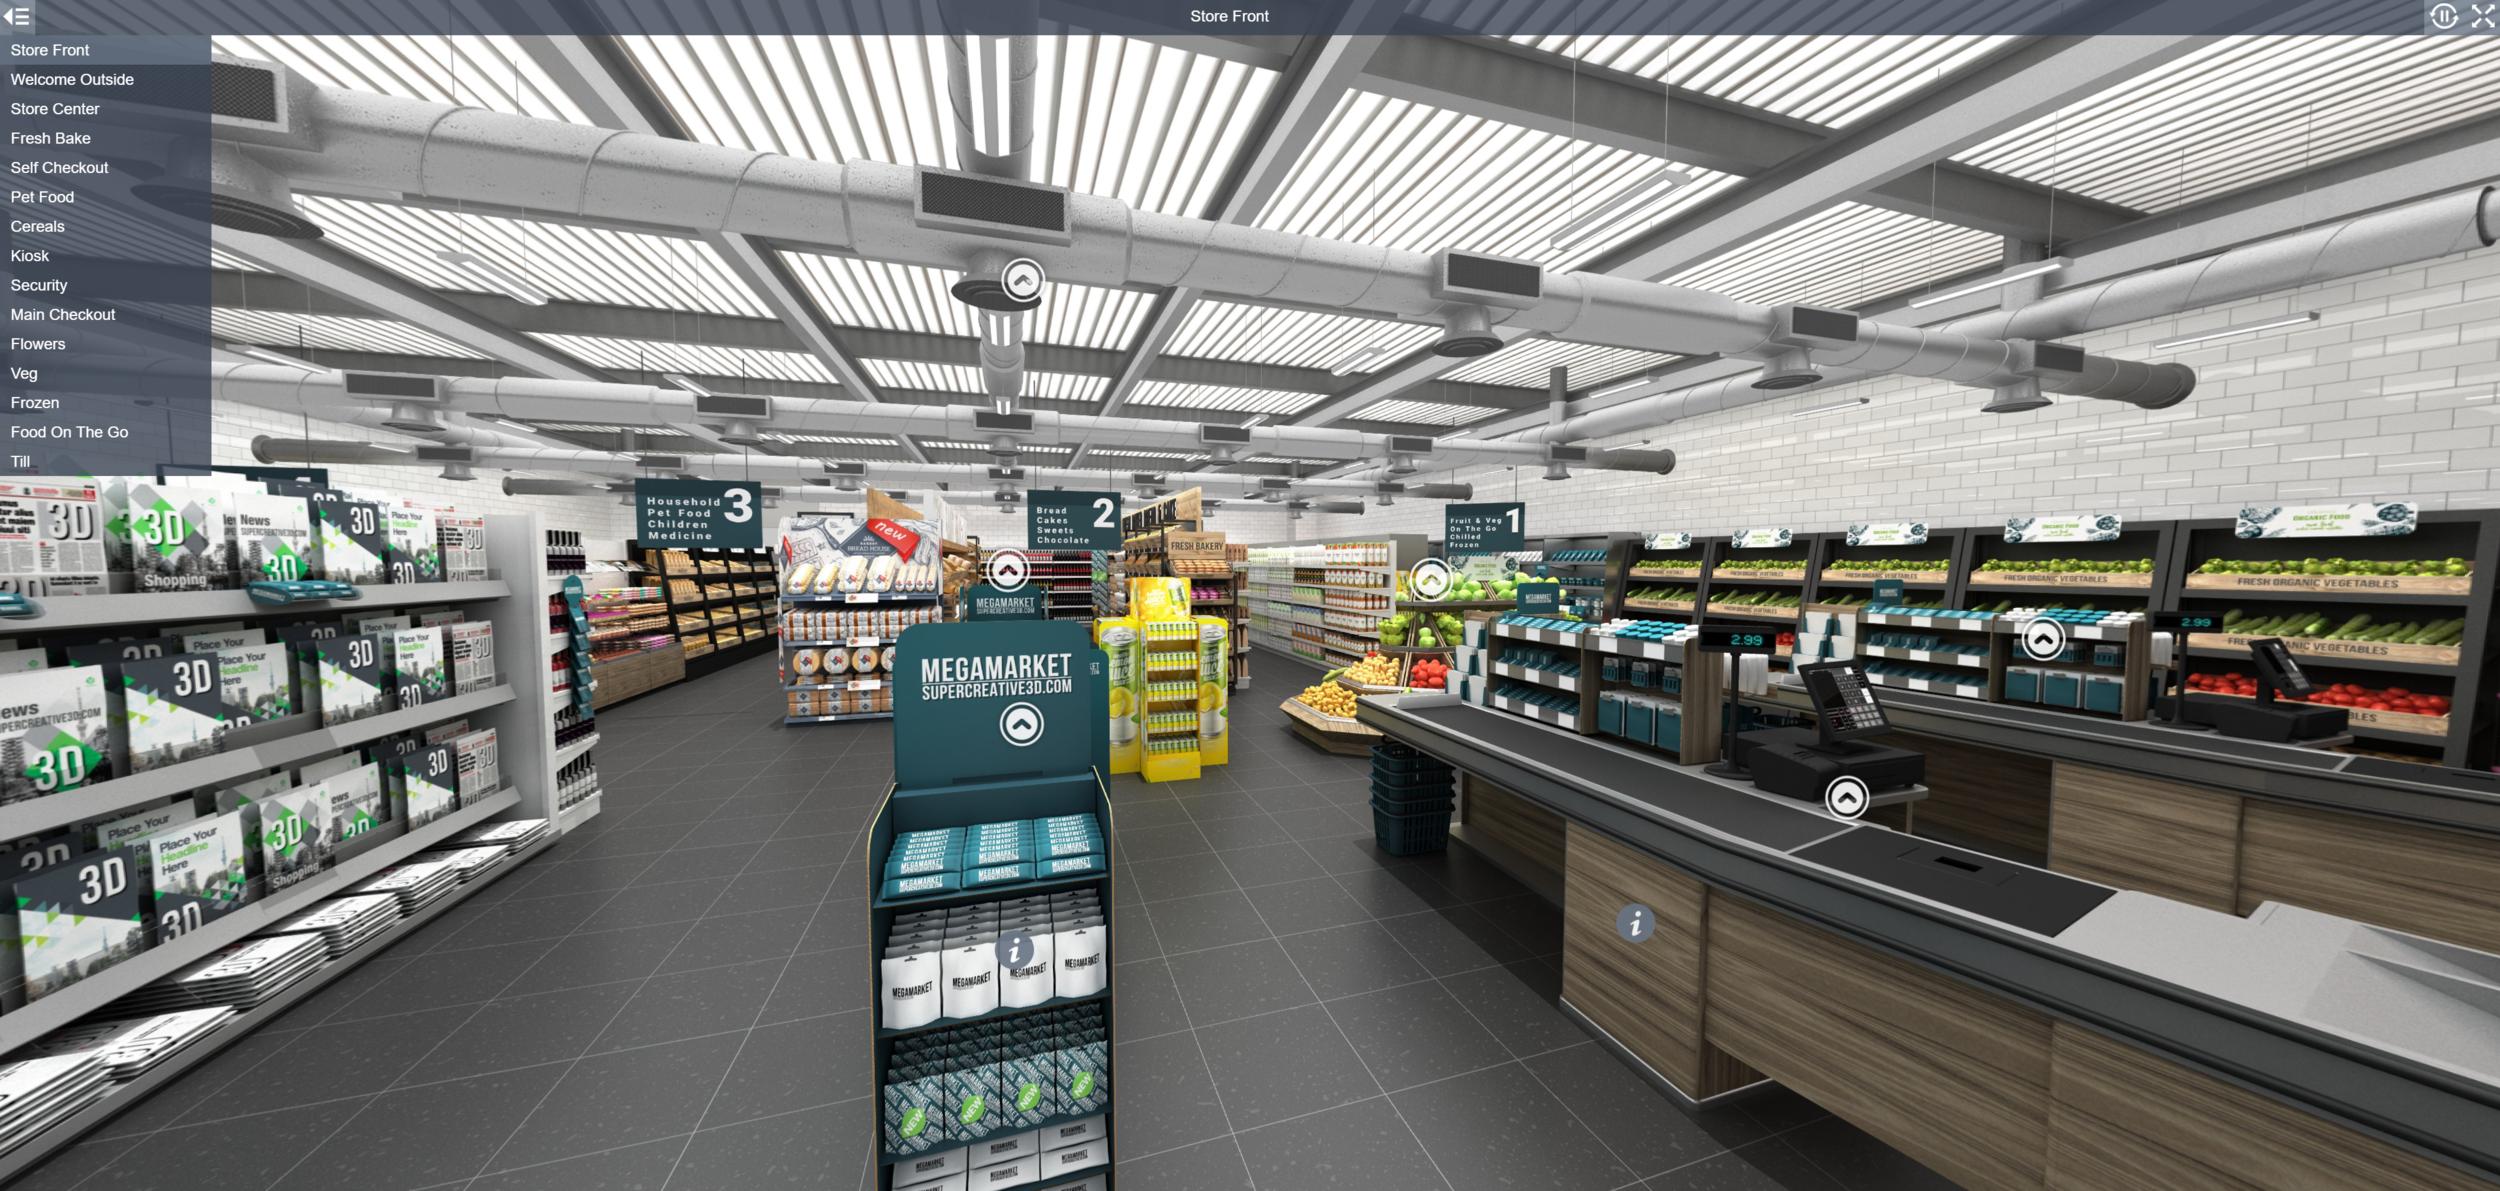 Supermarket 3D 360 Store interactive 001.PNG